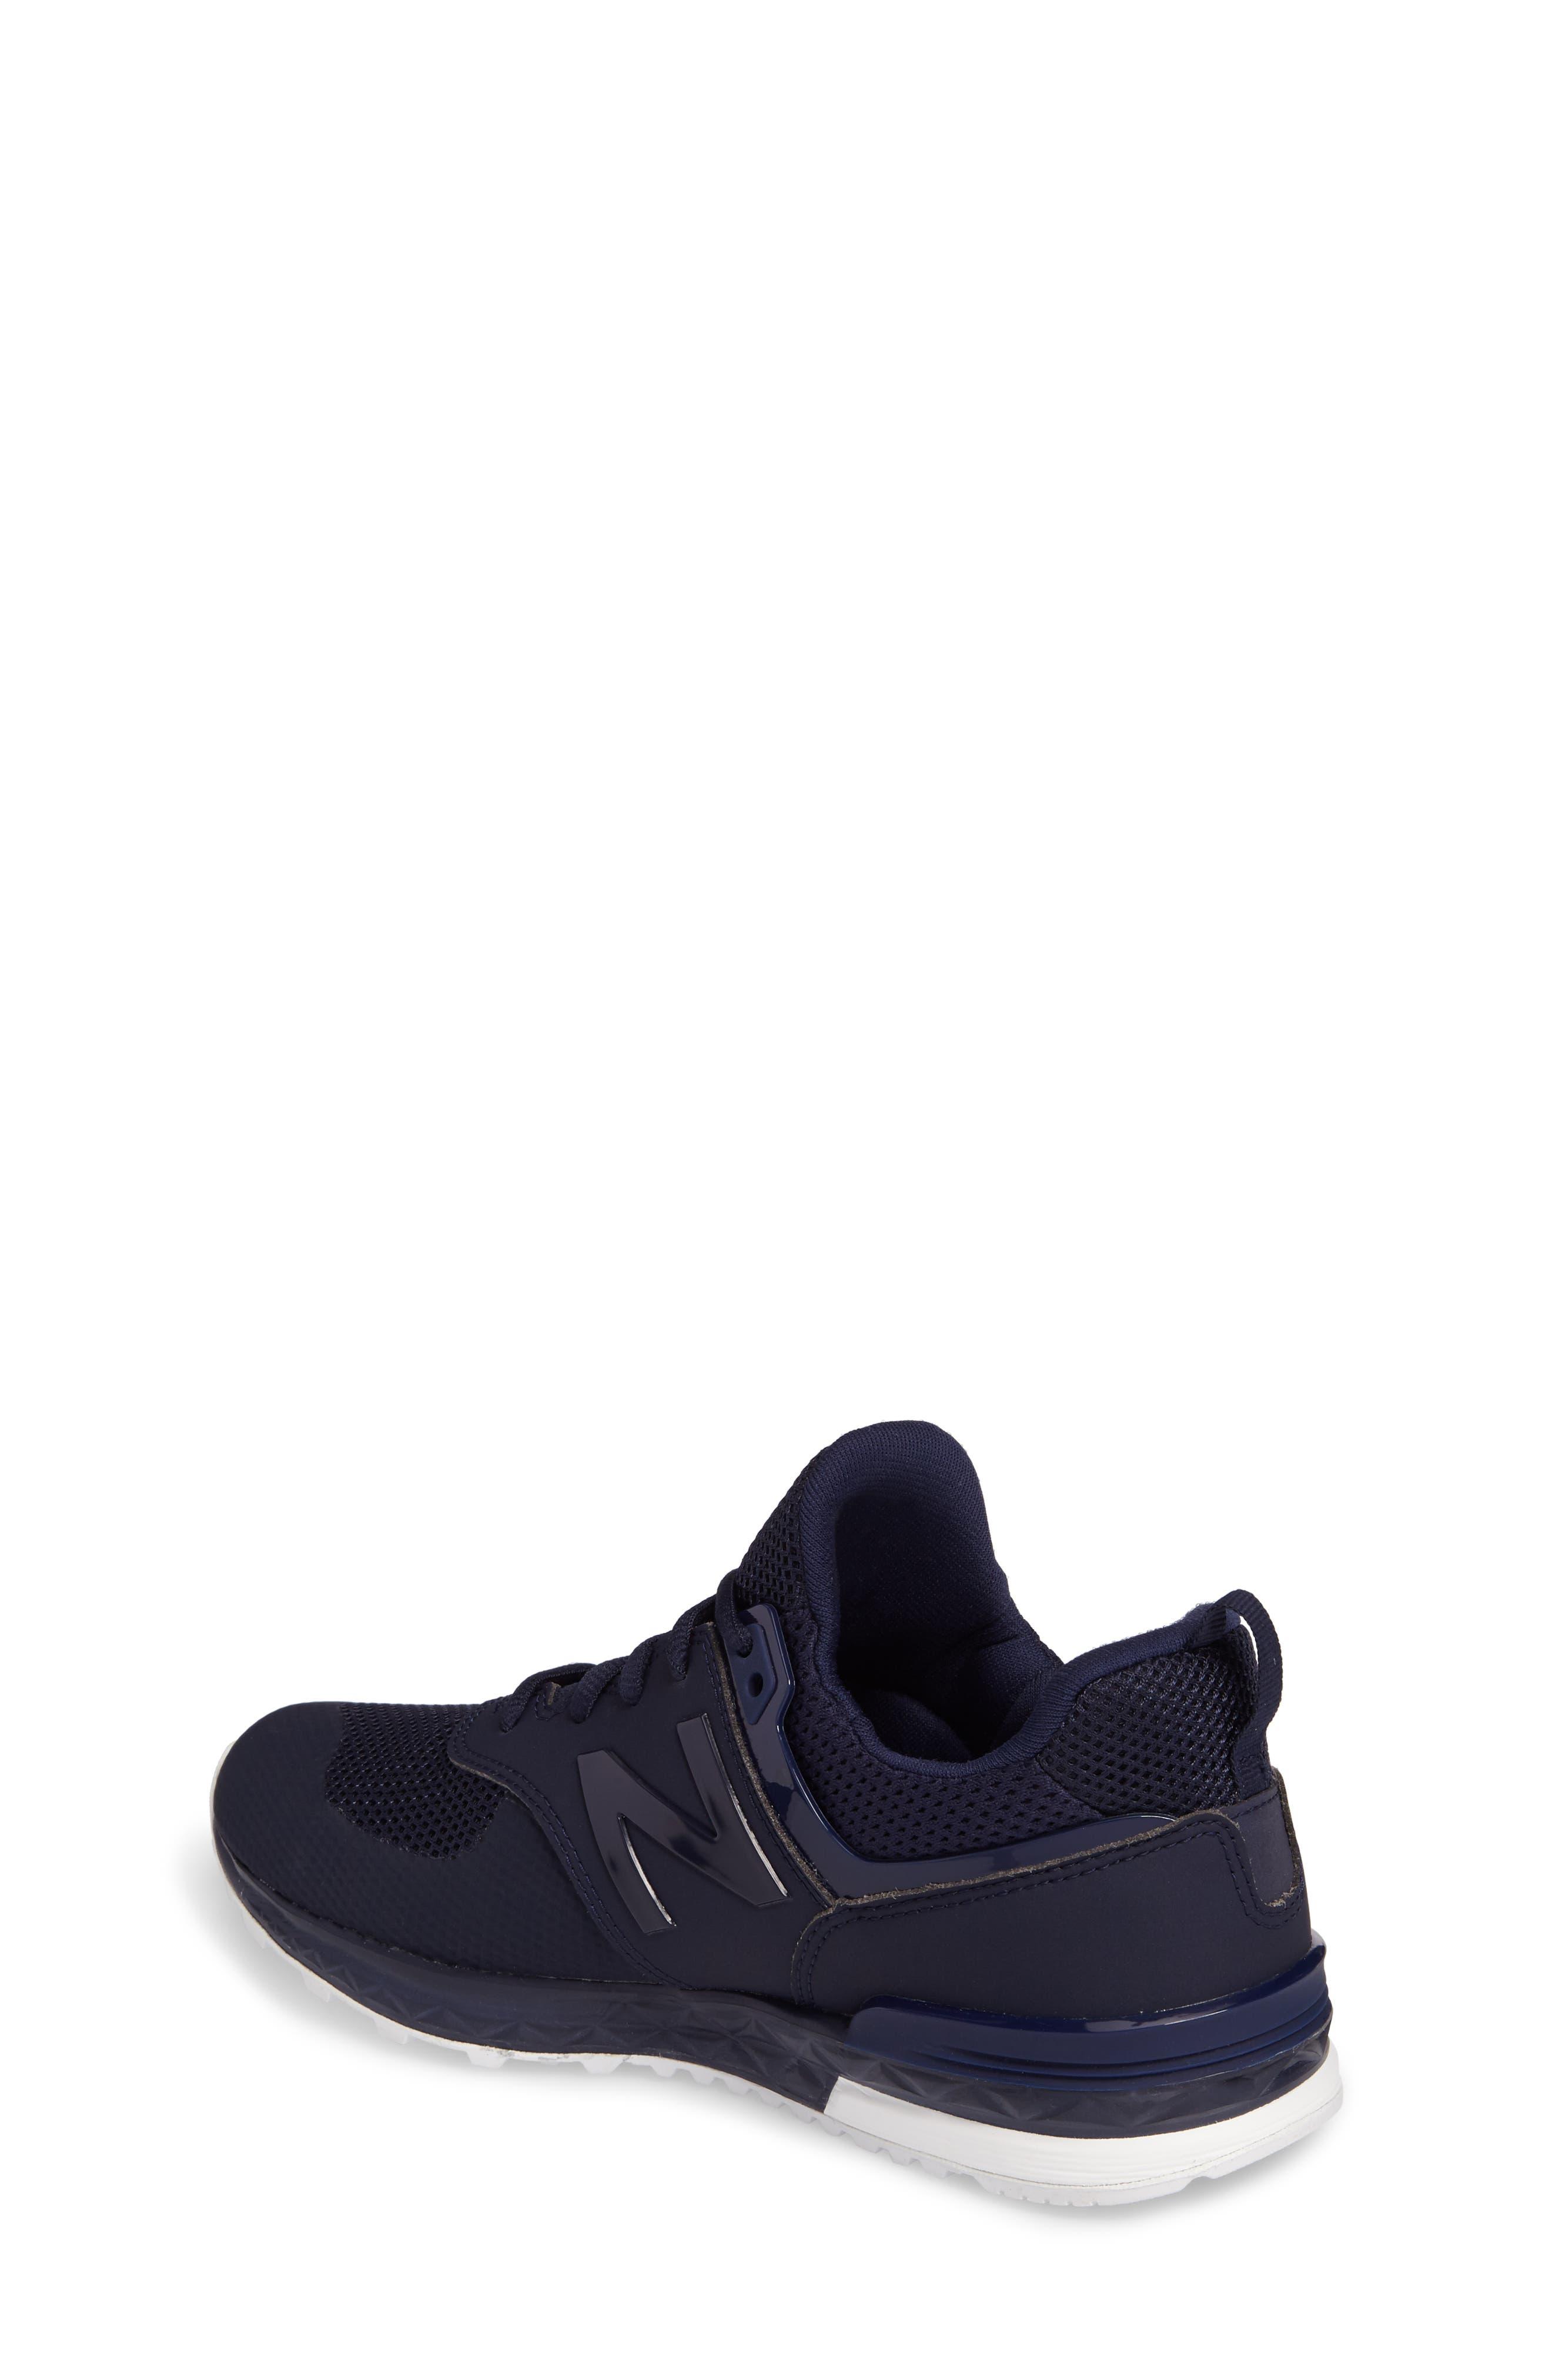 Alternate Image 2  - New Balance 574 Sport Sneaker (Baby, Walker, Toddler, Little Kid & Big Kid)